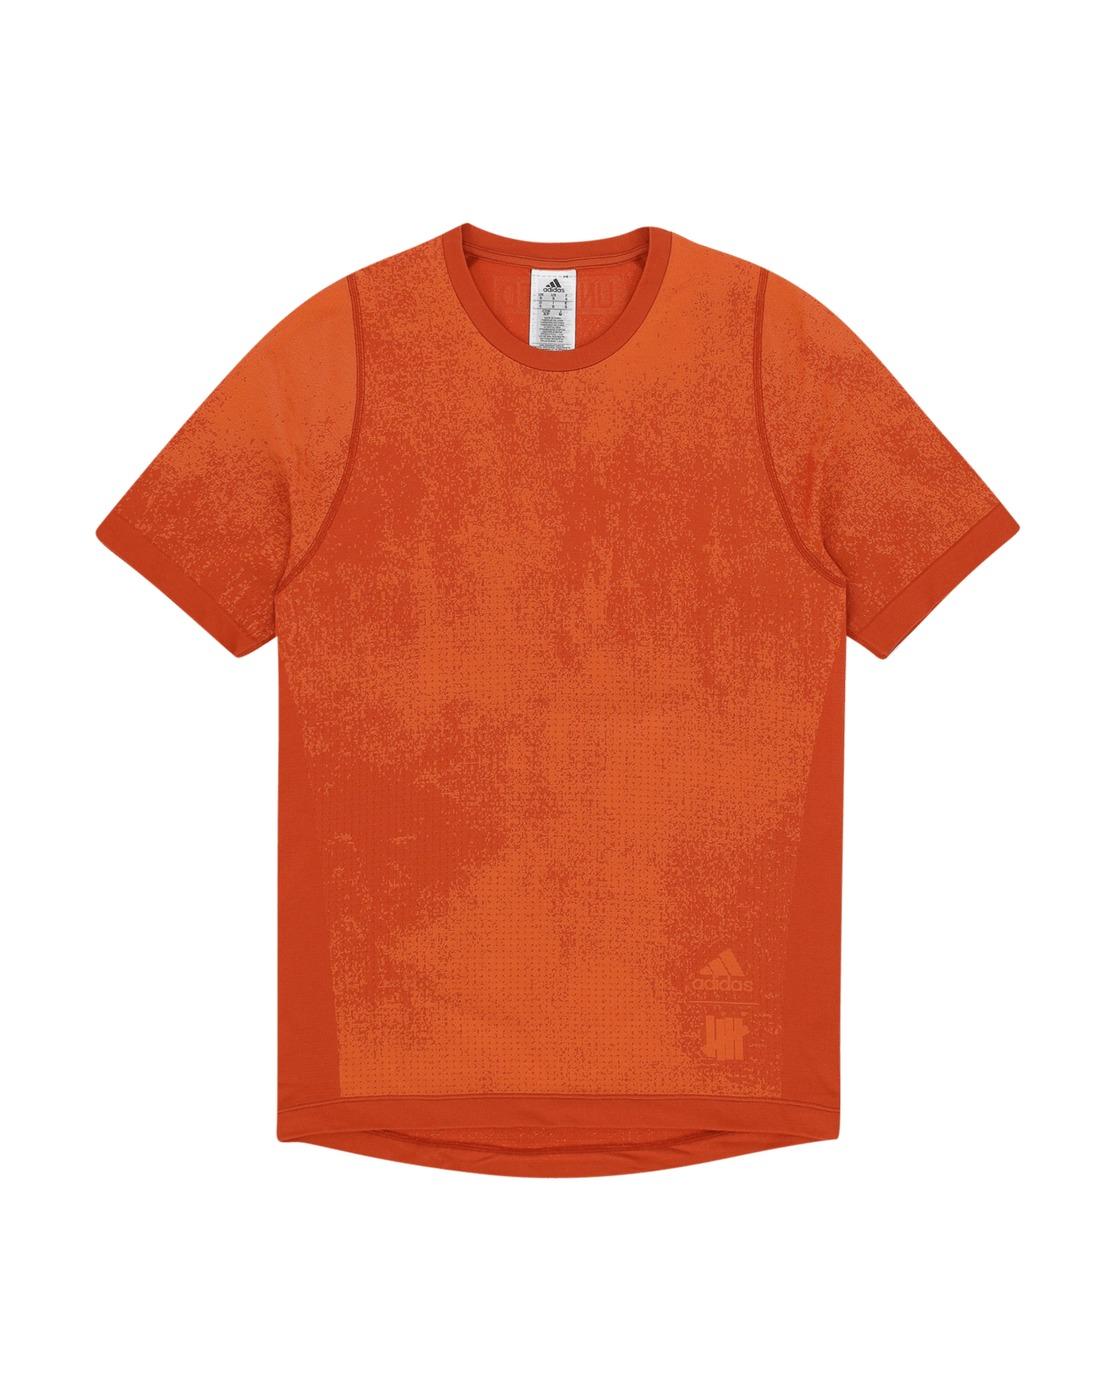 Photo: Adidas Originals Adidas X Undefeated Knit T Shirts Orange